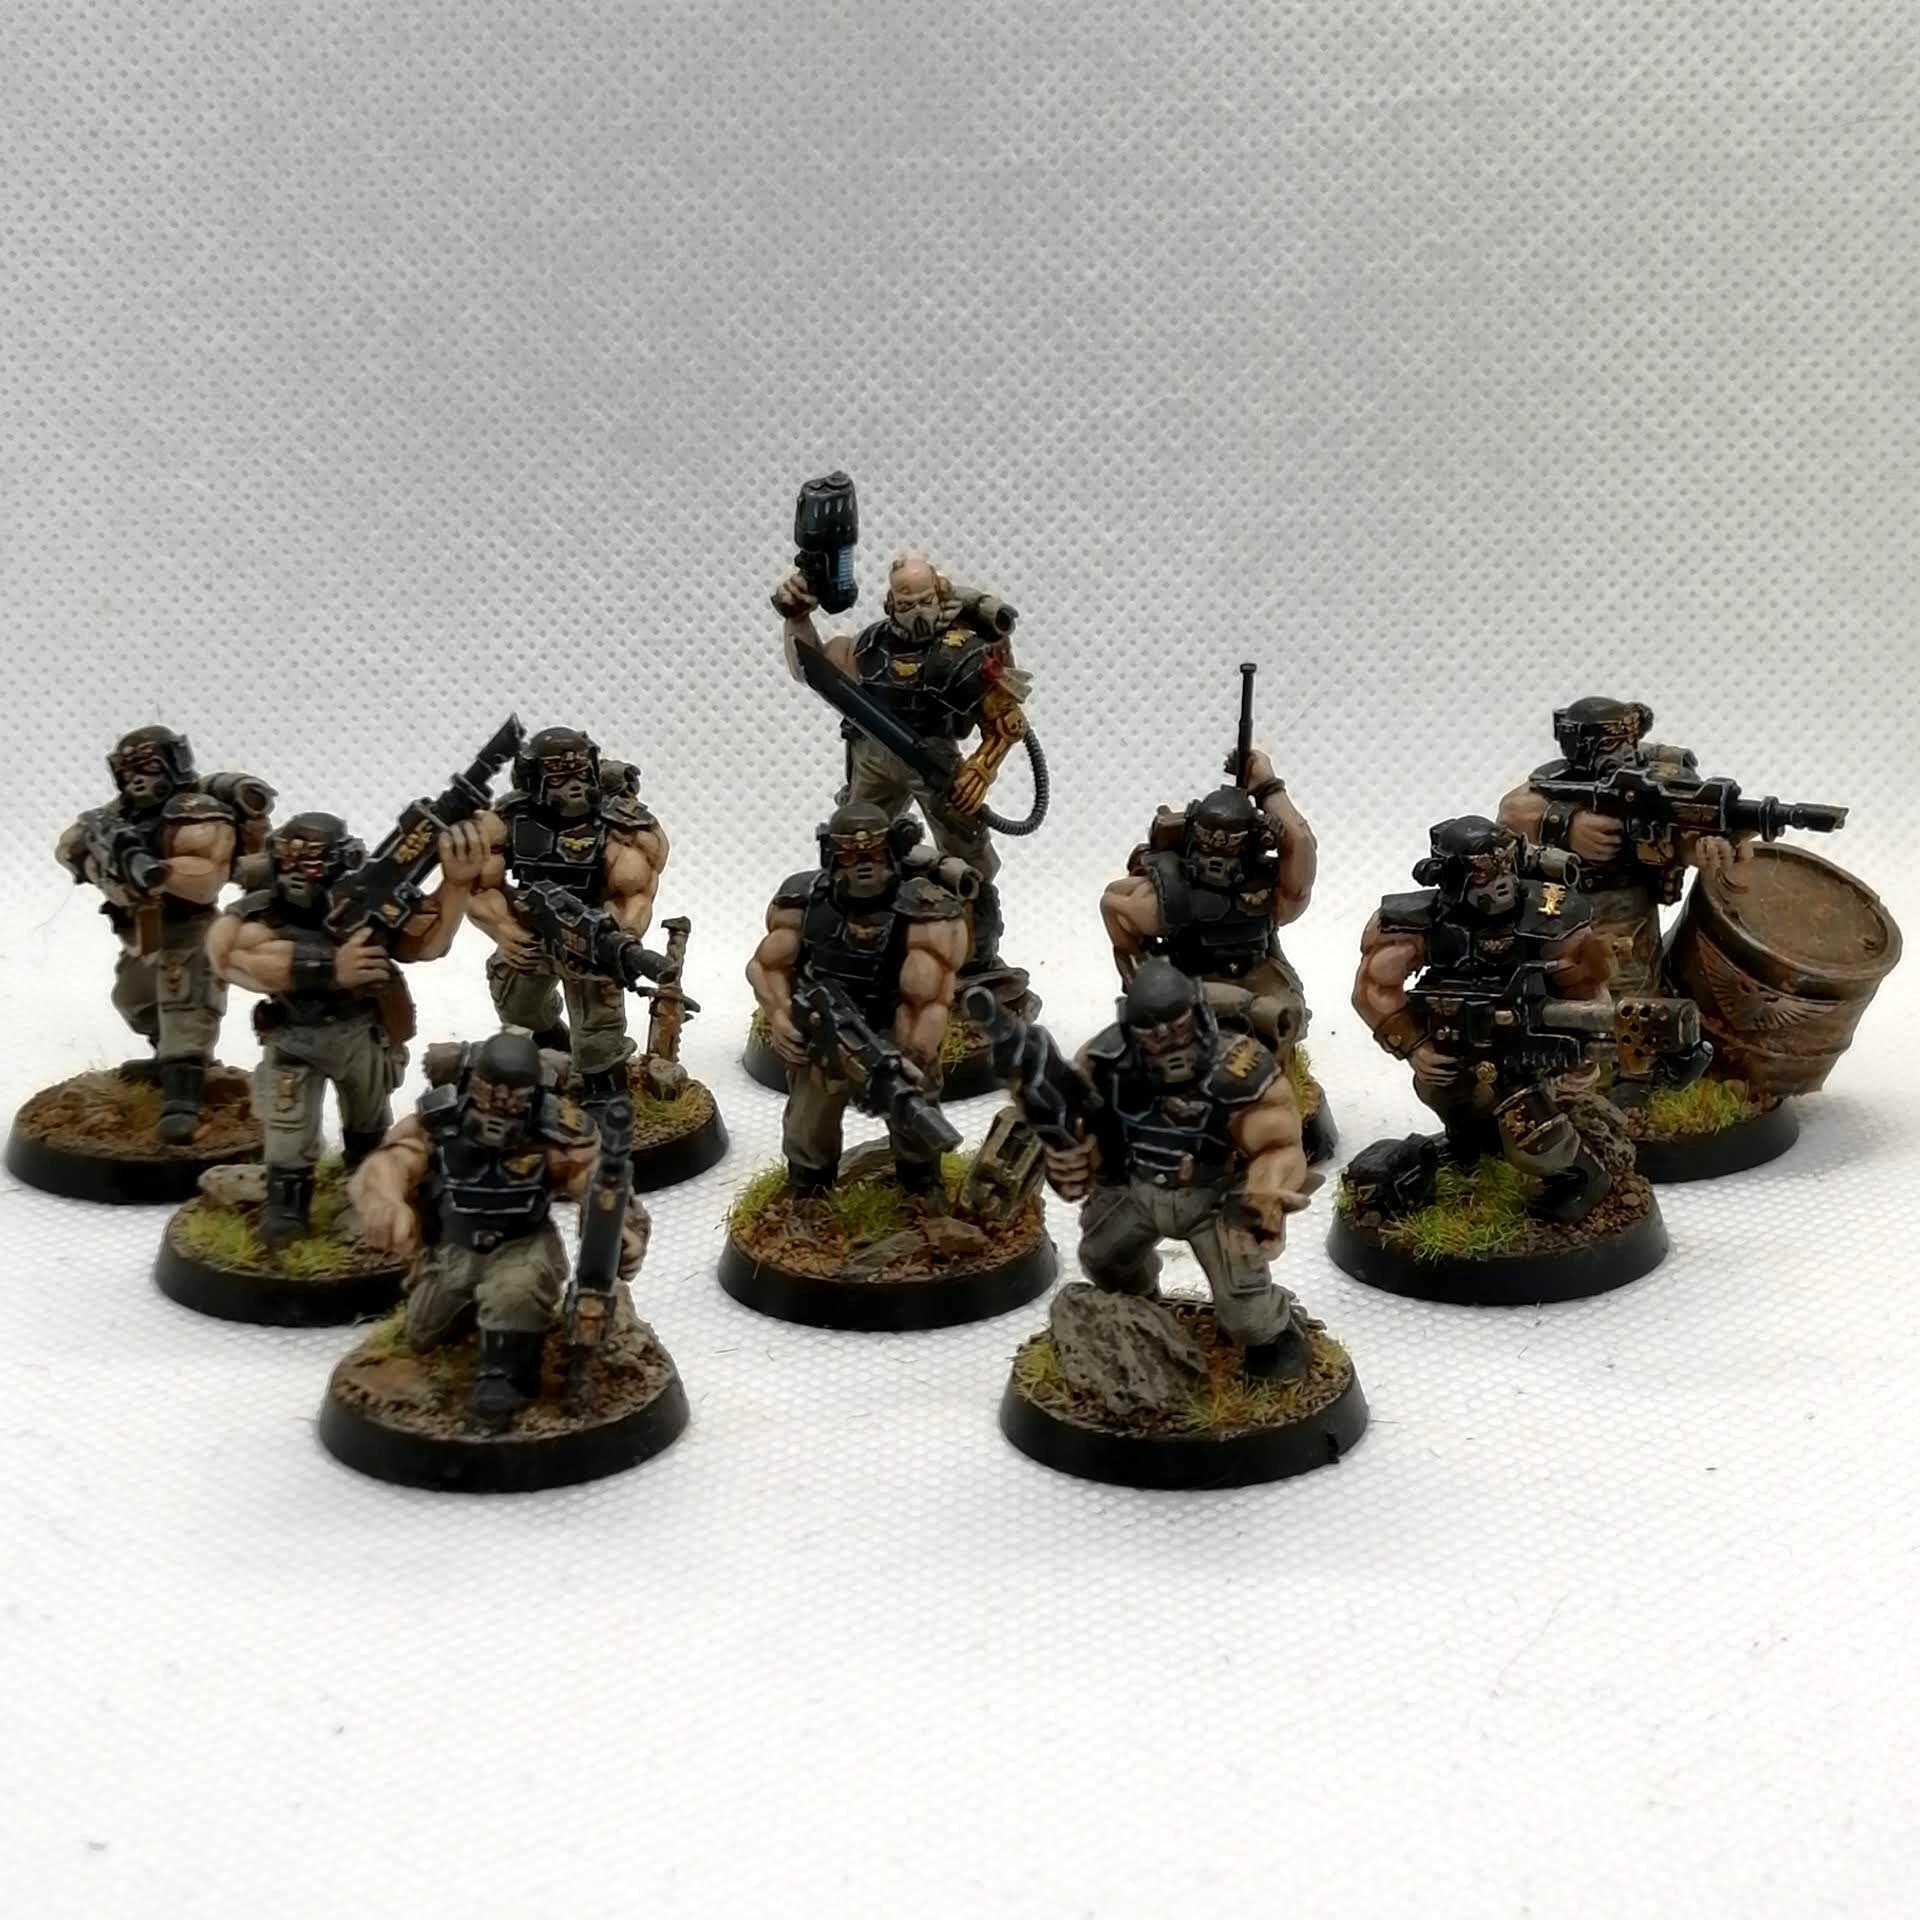 Astra, Astra Militarum, Conversion, Games Workshop, Guard, Imperial, Imperial Guard, Imperium, Inquisition, Kitbash, Militarum, Warhammer 40,000